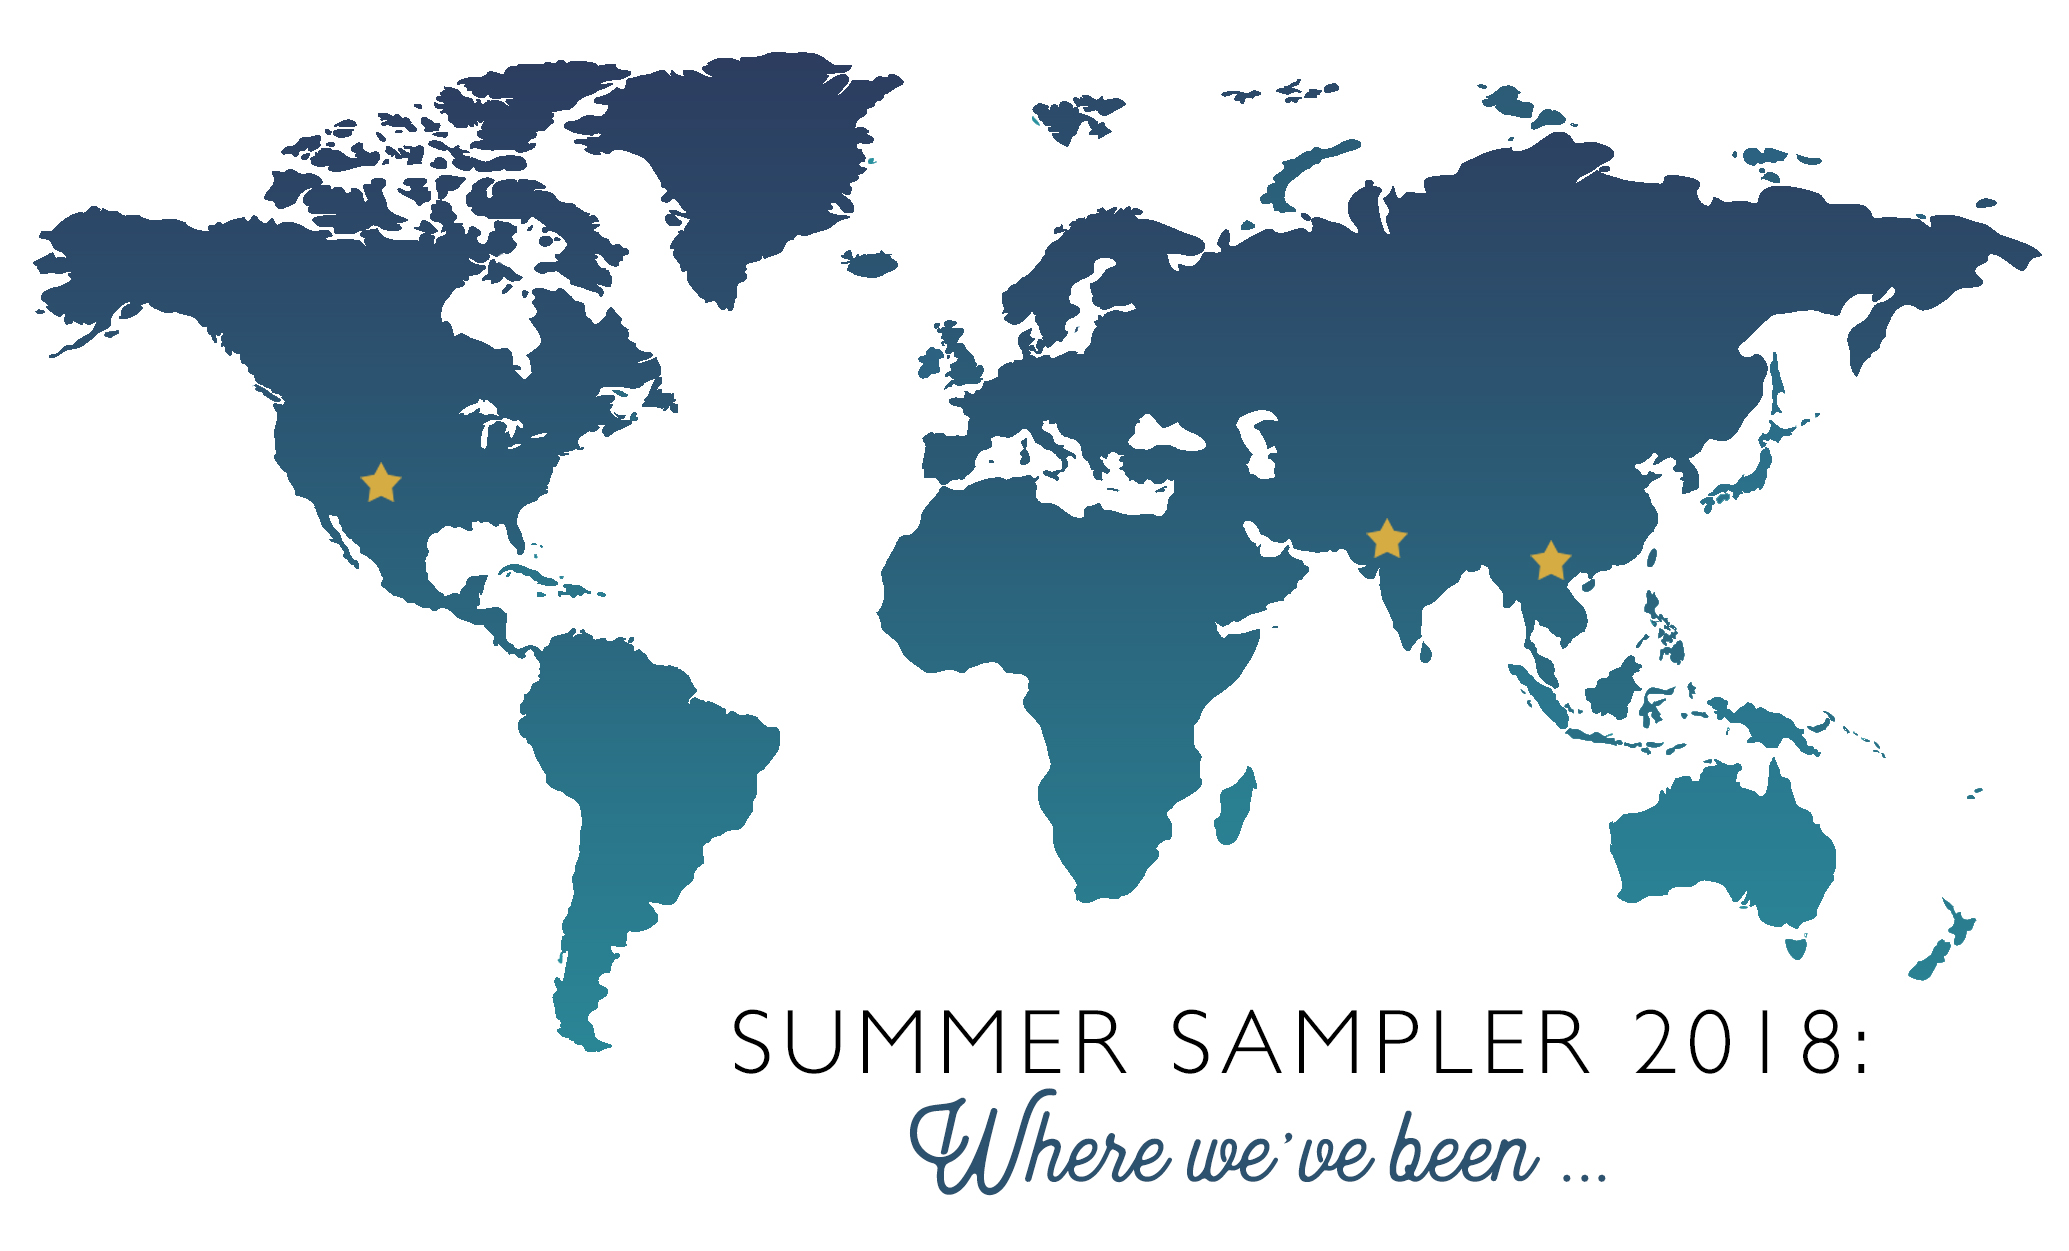 Summer Sampler 2018 - New Mexico